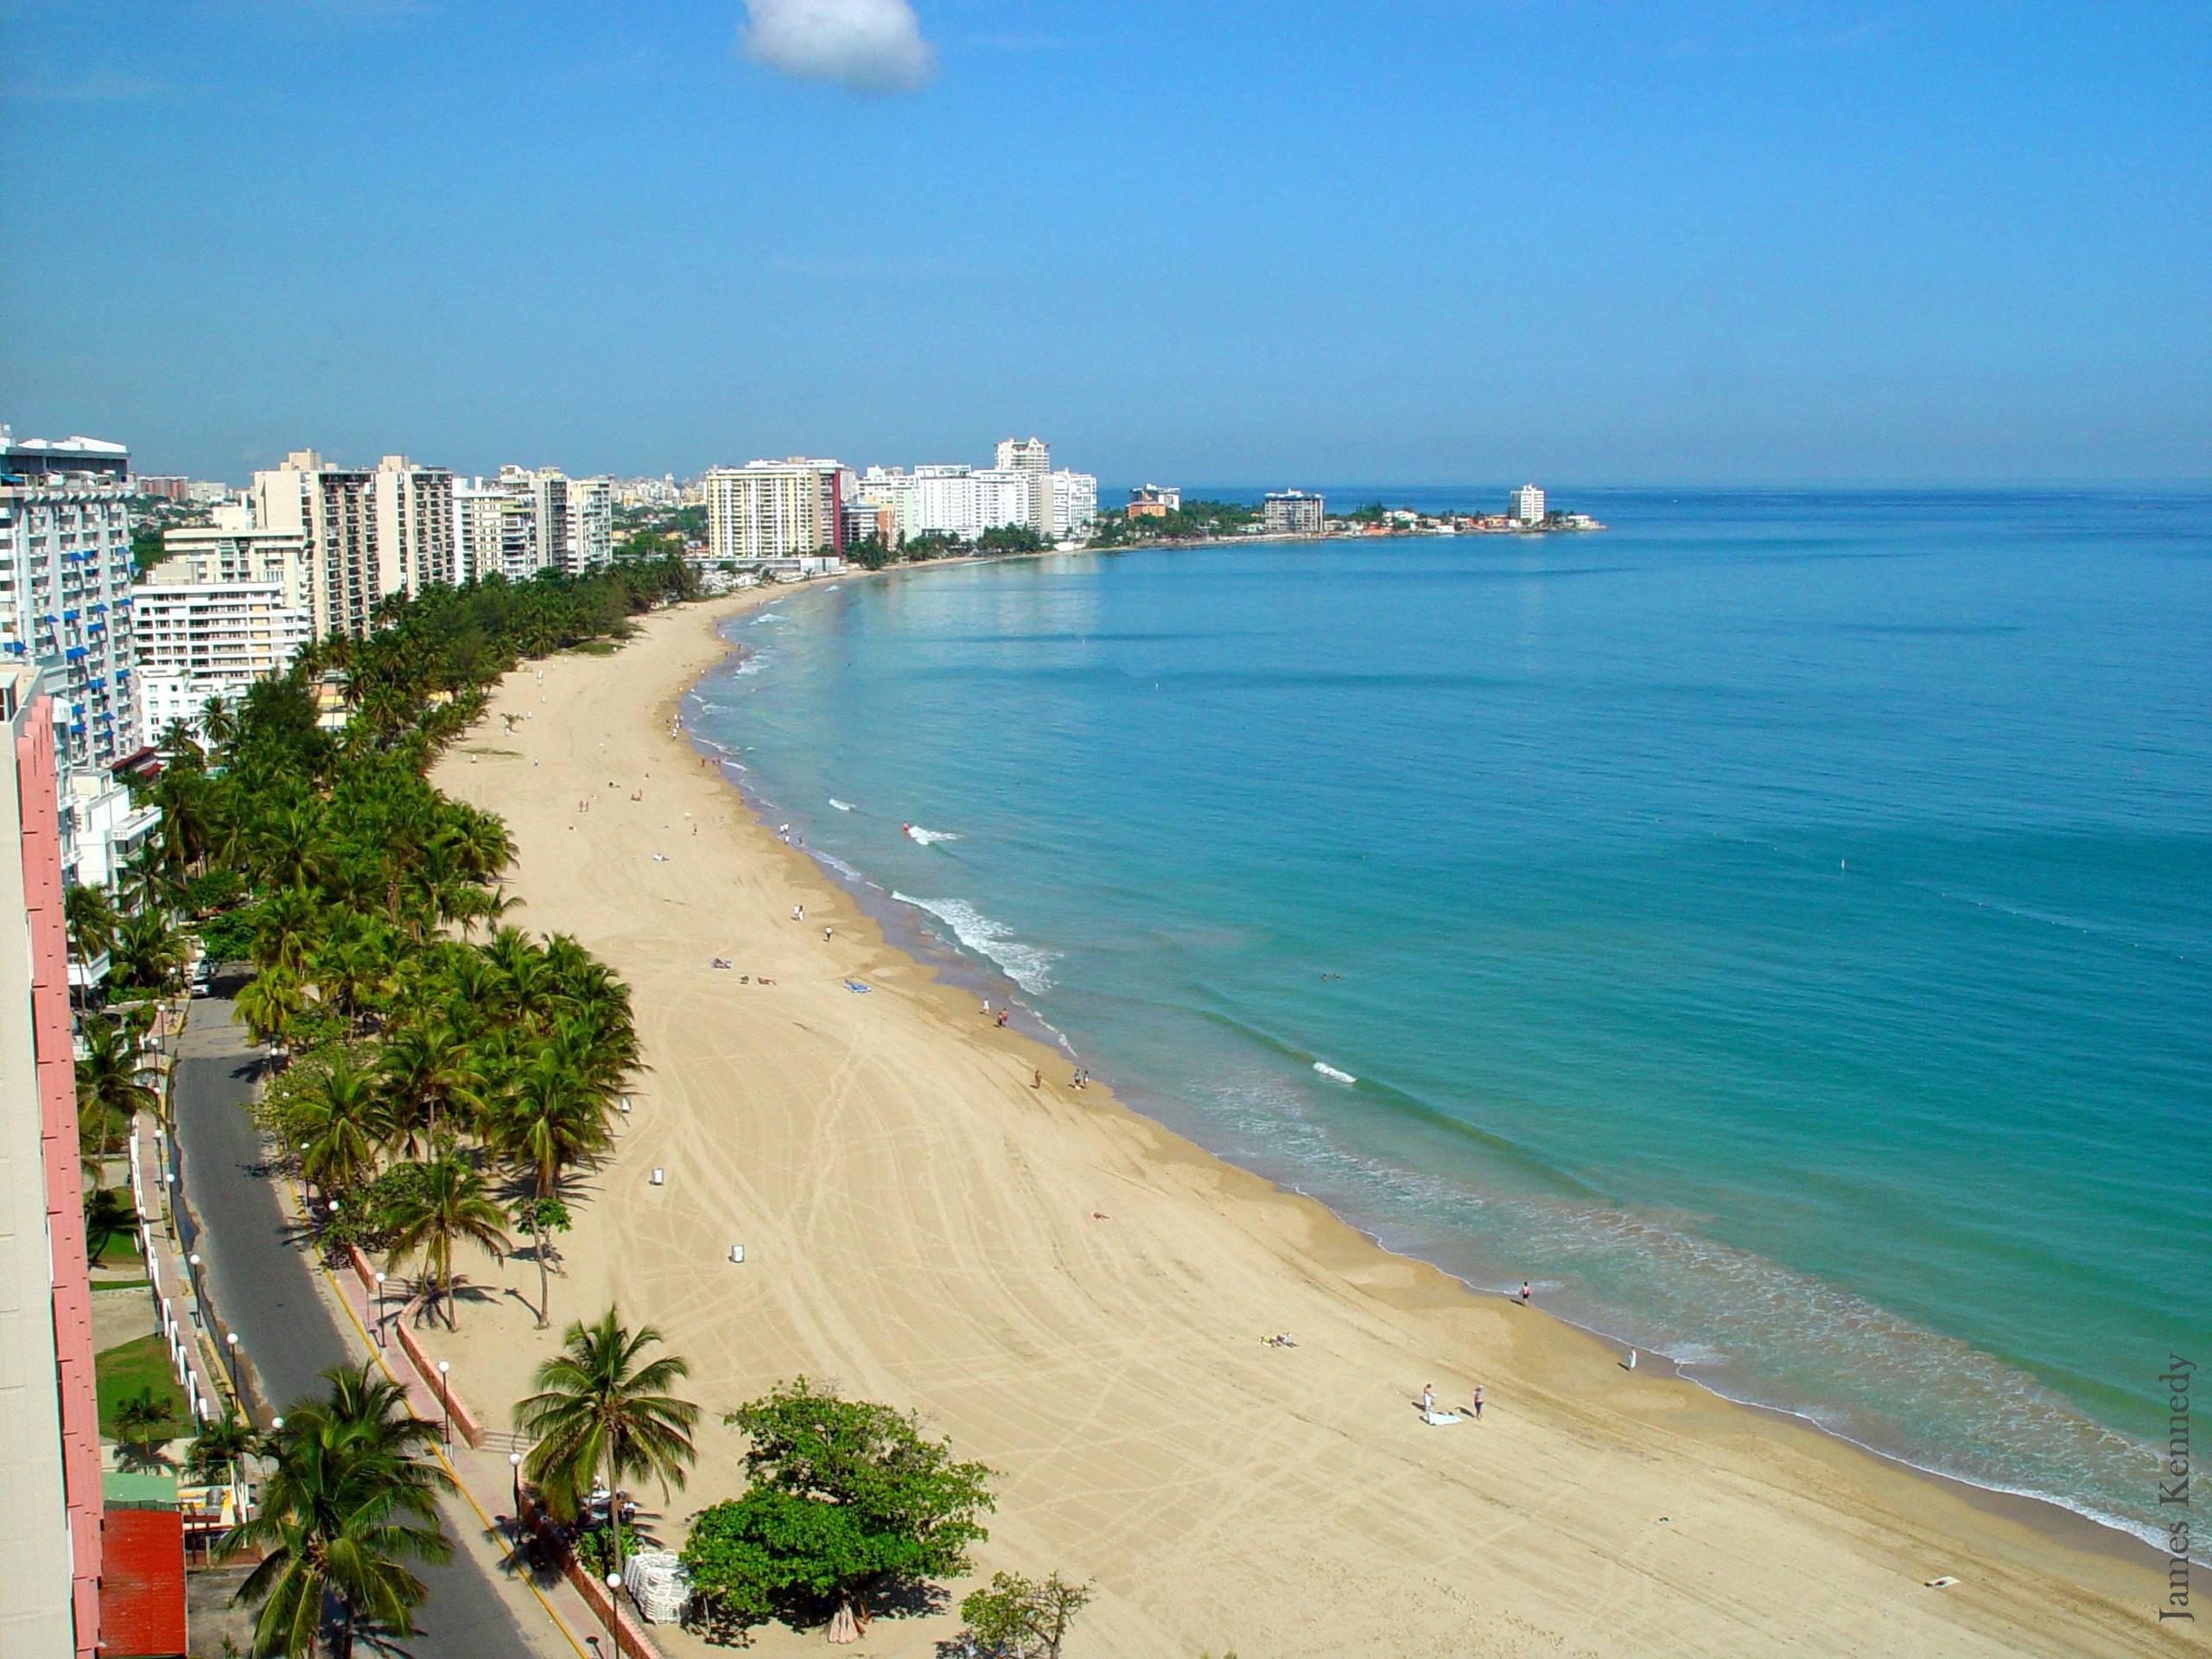 Puerto Rico Beaches Wallpapers